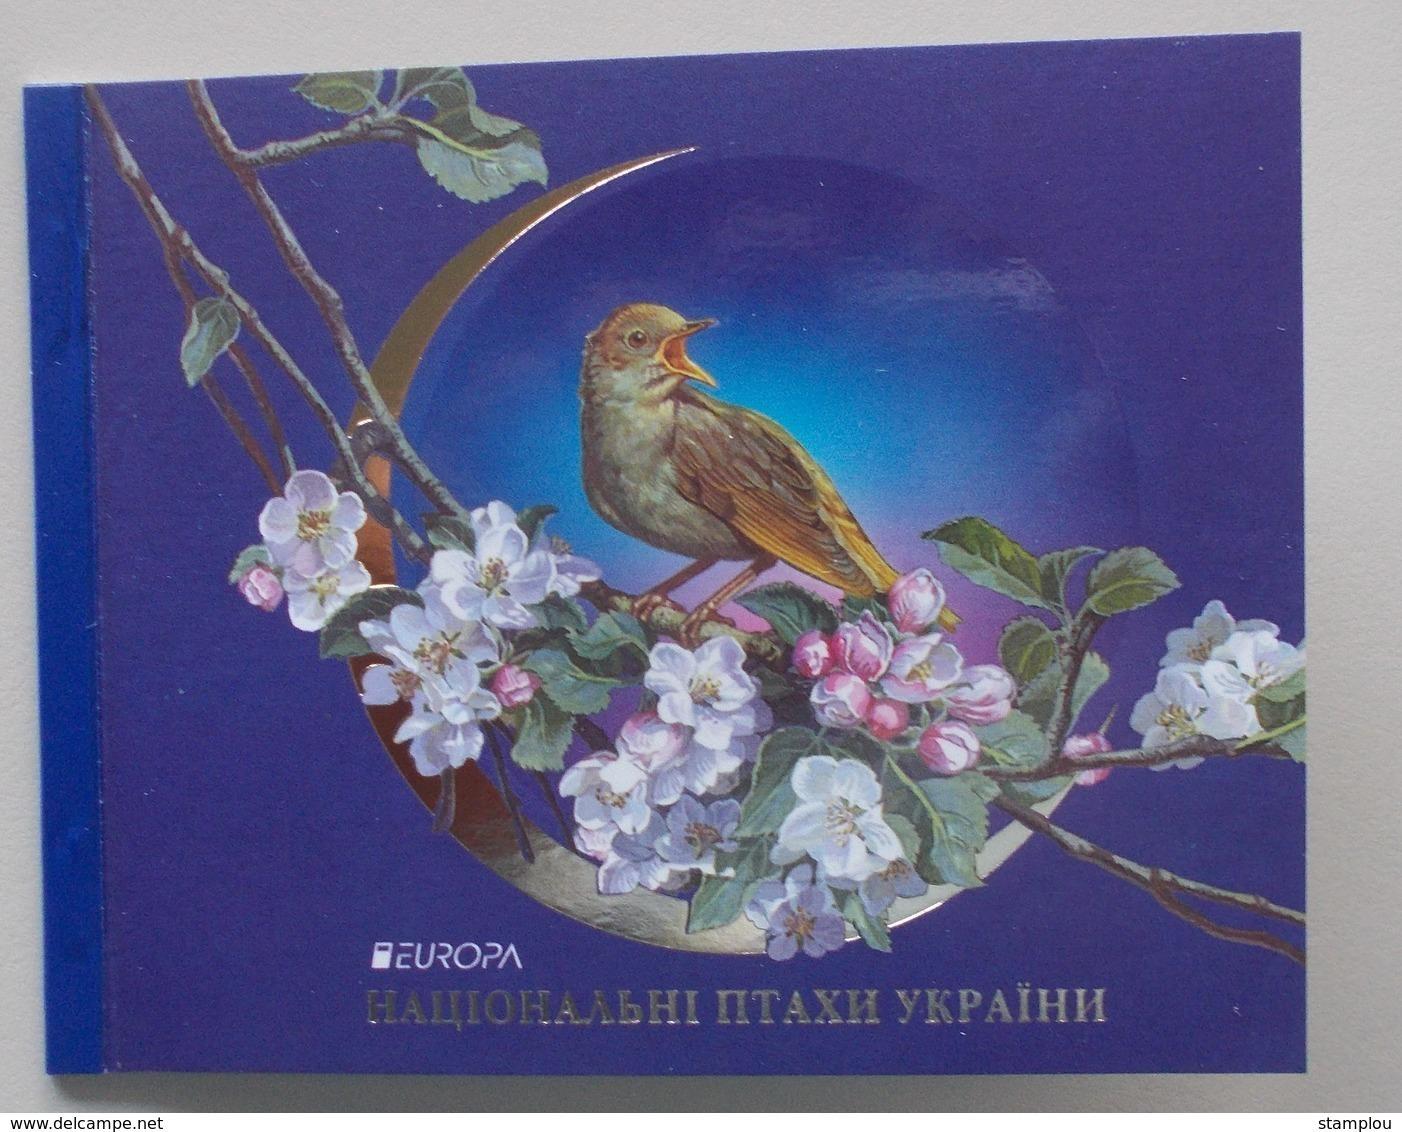 Oekraine-Ukraine 2019 Cept Birds Booklet Mint - 2019